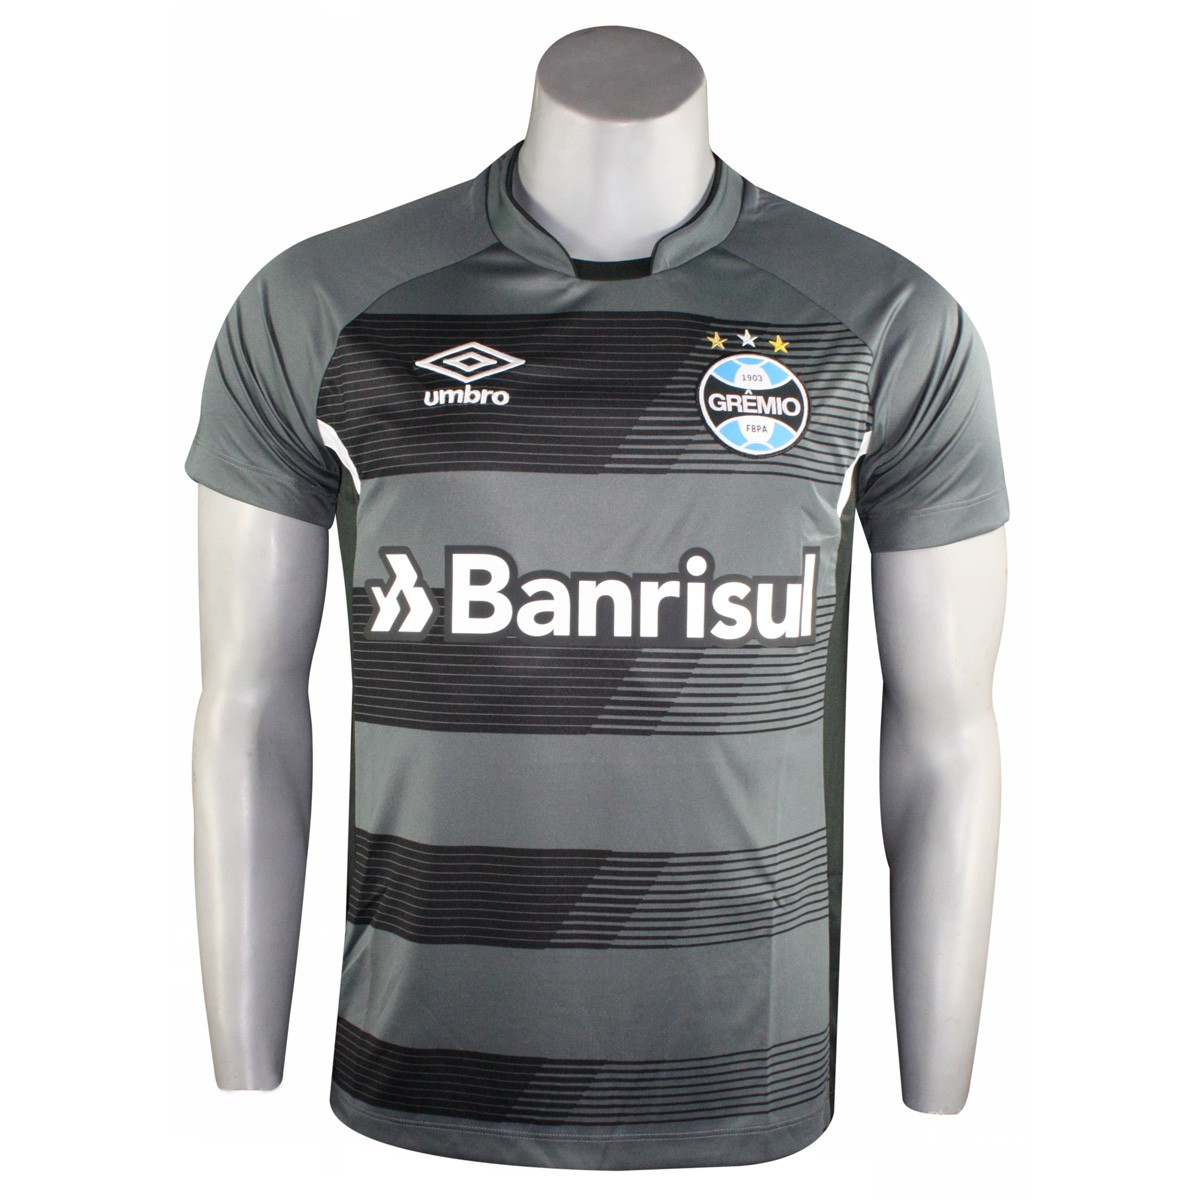 Camisa Masculina Umbro Grêmio Treino 2017 3G160085.812 Grafite Preto Branco 1de5cb9b535d9